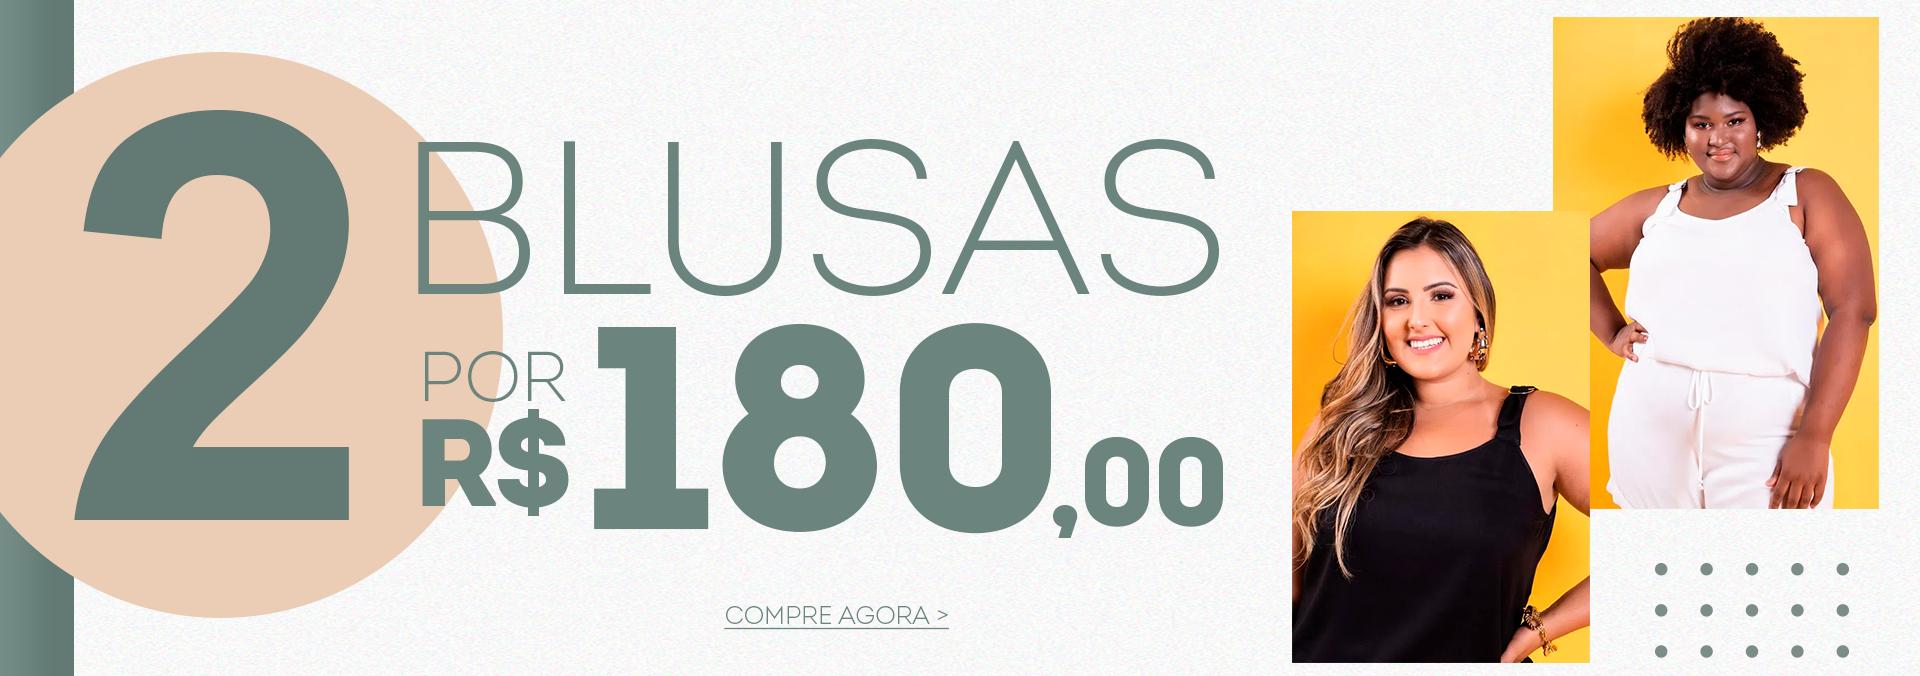 Banner 2 Blusas por R$180